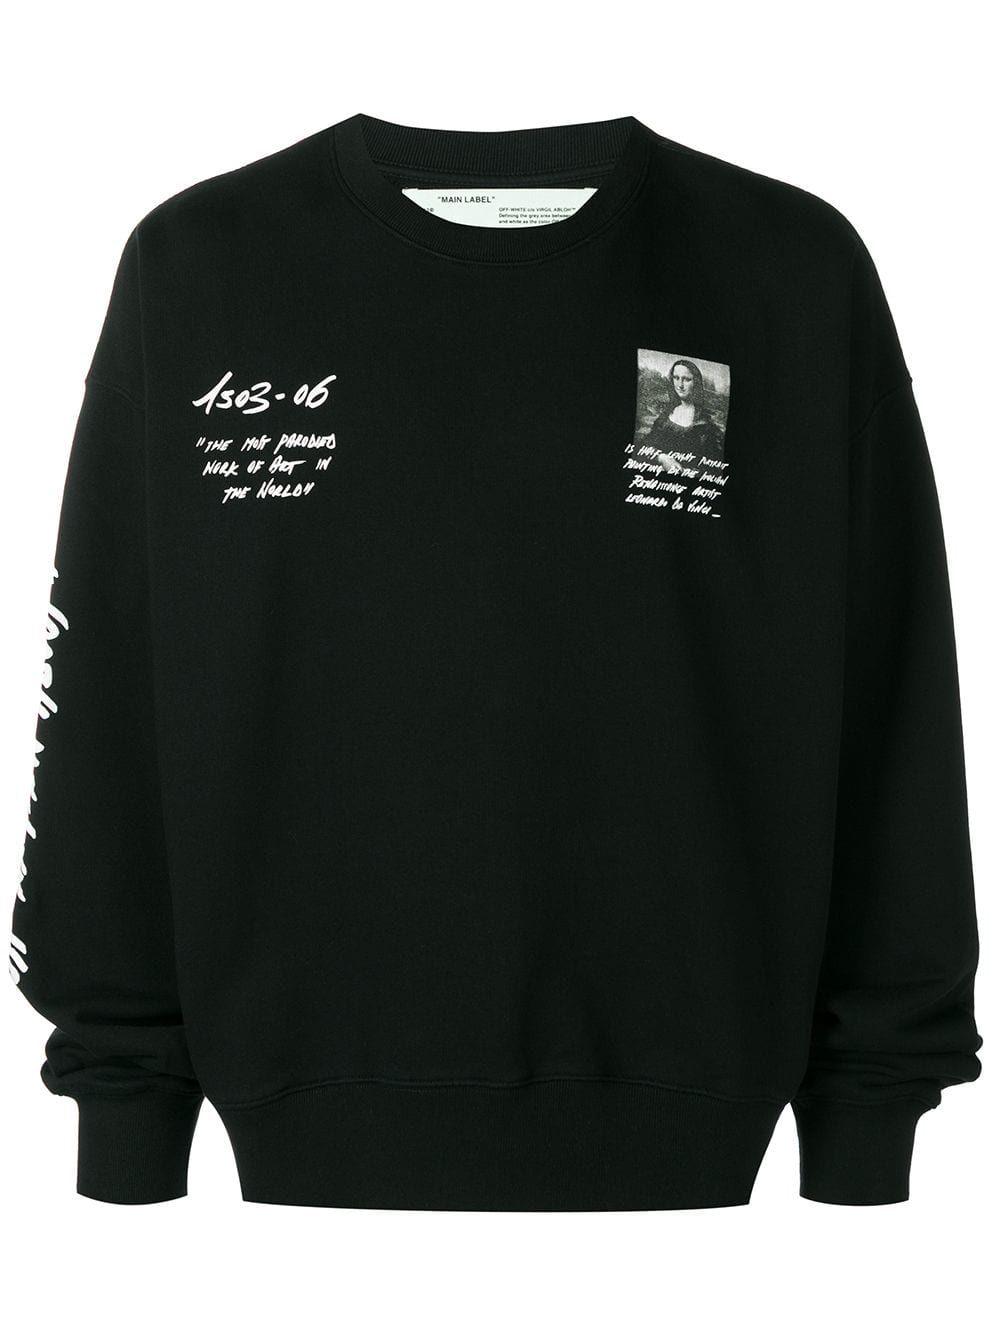 Off White Off White Mona Lisa Print Sweatshirt Black Off White Cloth [ 1334 x 1000 Pixel ]